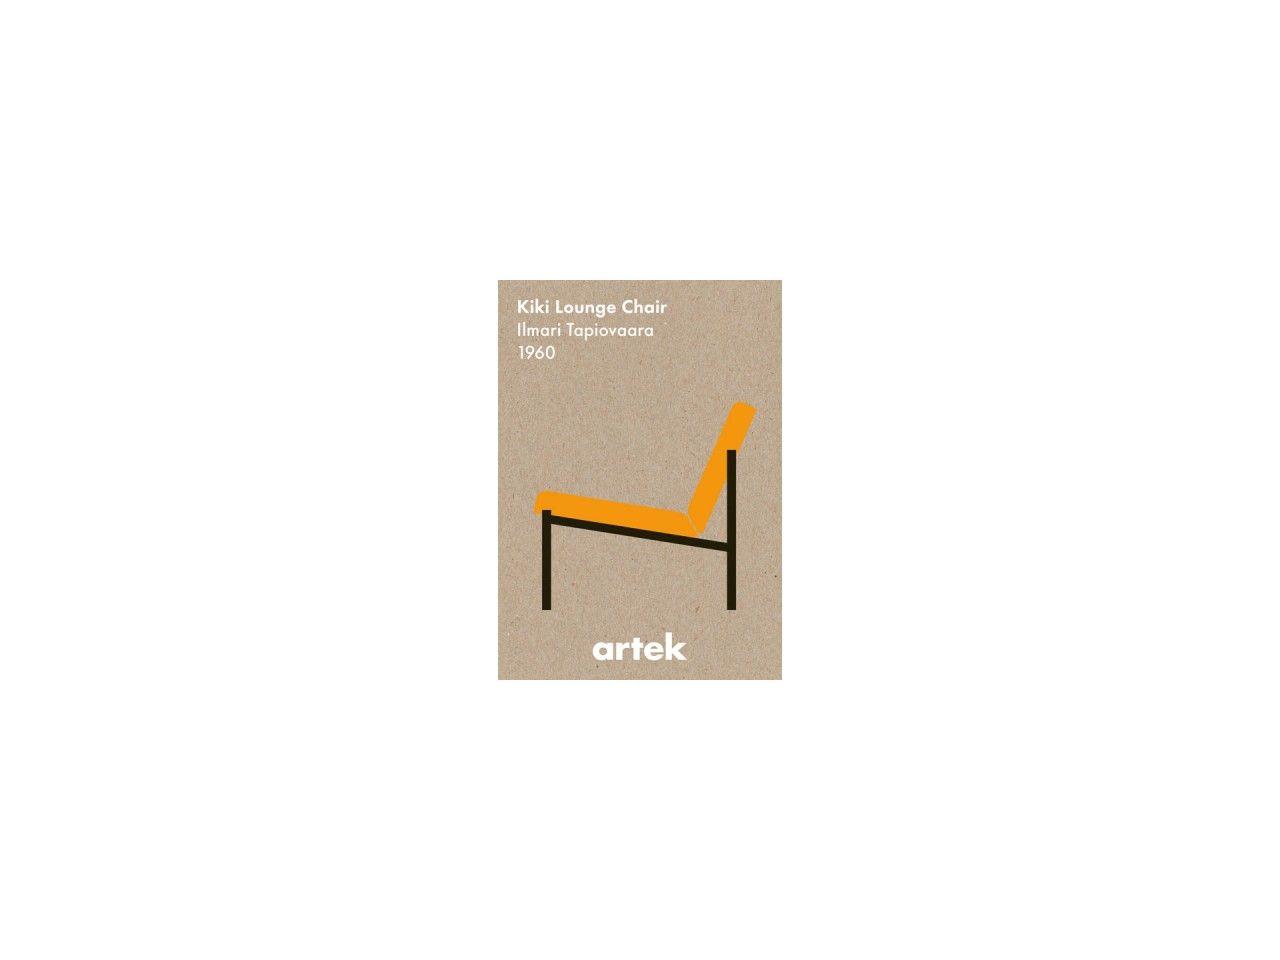 Artek - Tuotteet - abc Collection - Poster - IKONI KIKI